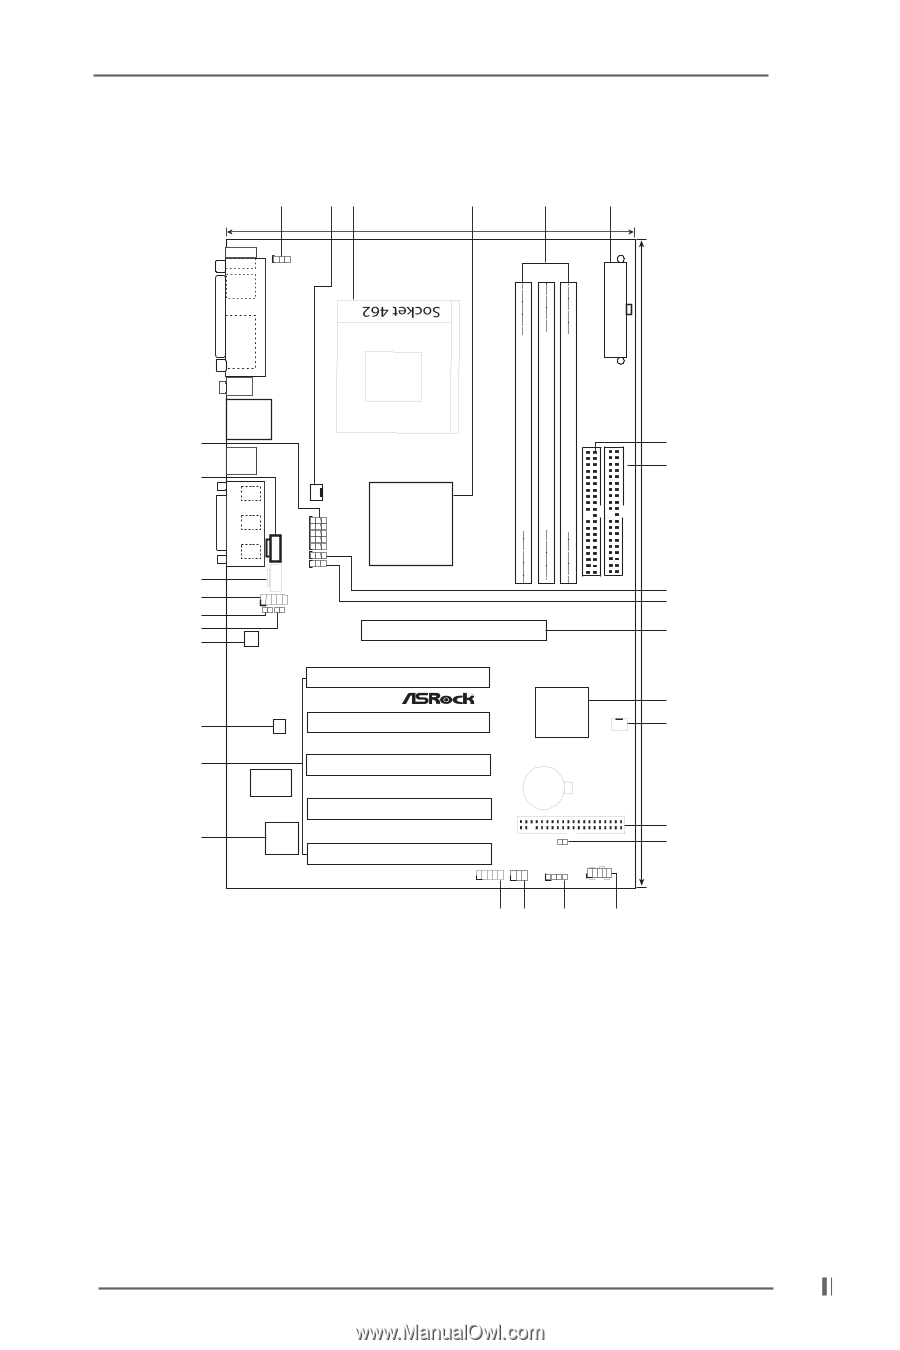 ASROCK K7S8XE / K7S8XE R3.0 DRIVER WINDOWS